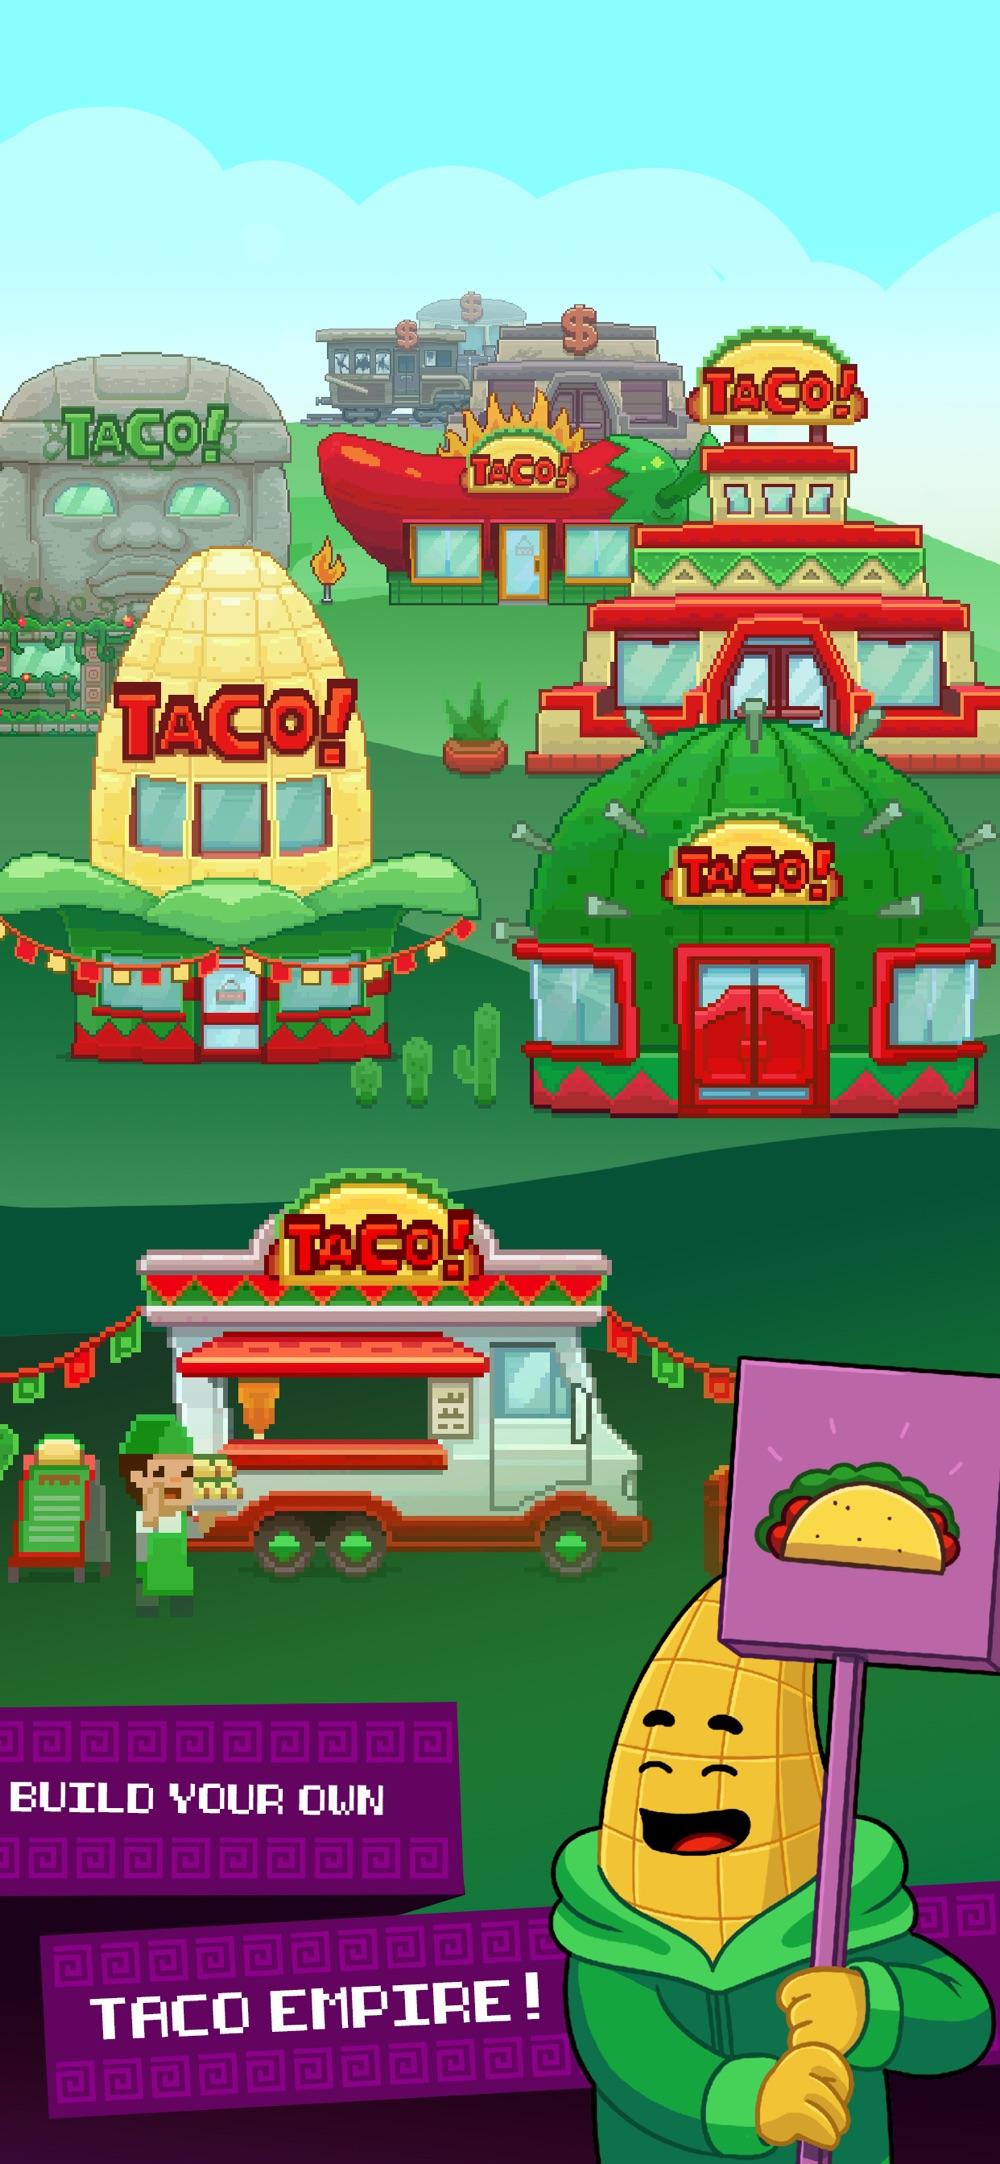 Mucho Taco hack tool